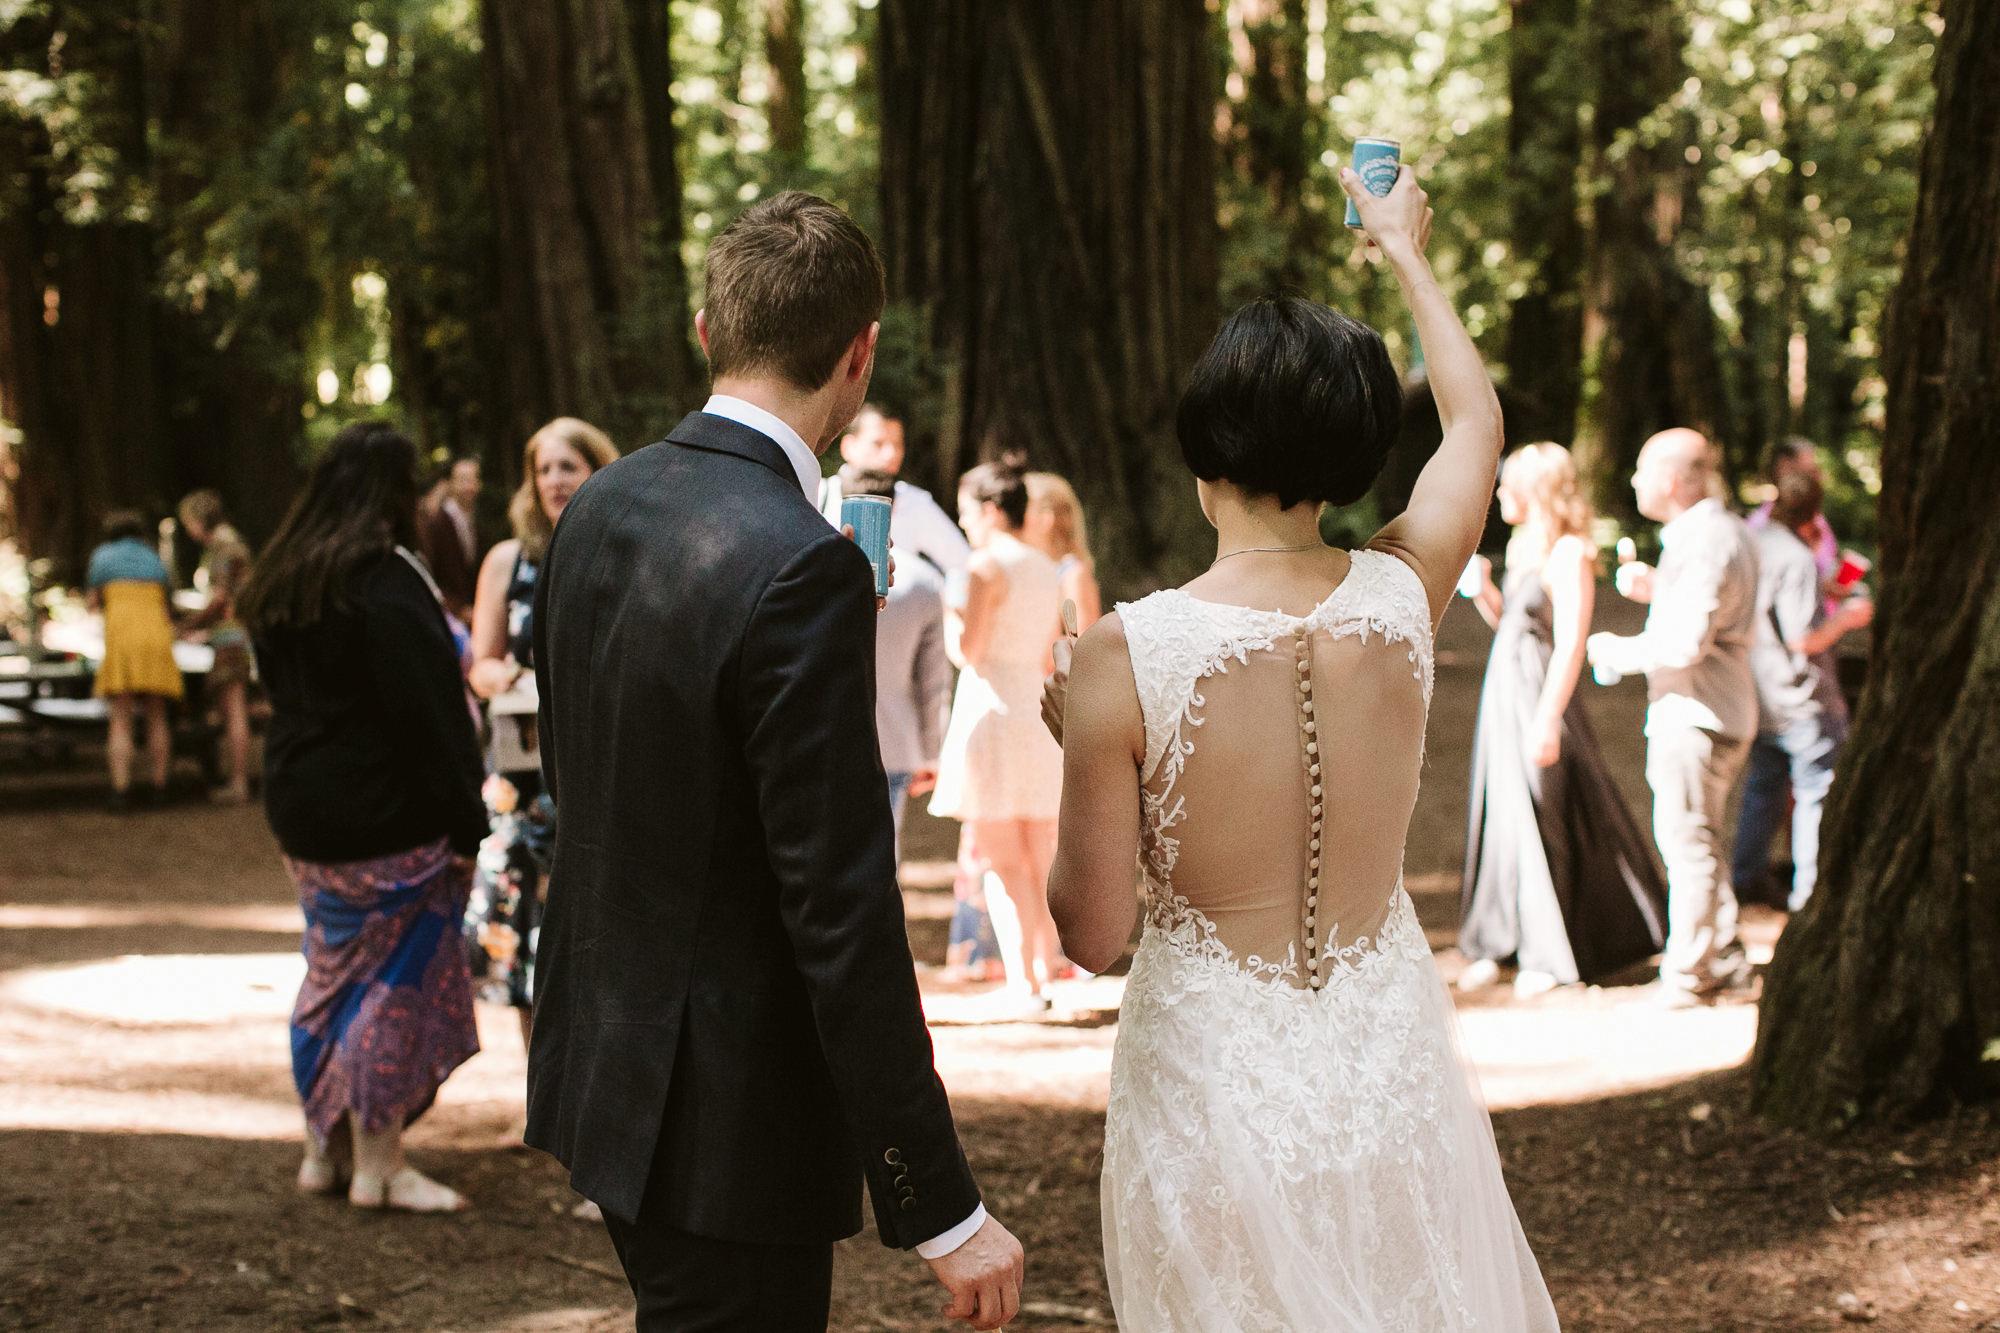 California-wedding-photographer-alfonso-flores-pamplin-groove-229.jpg